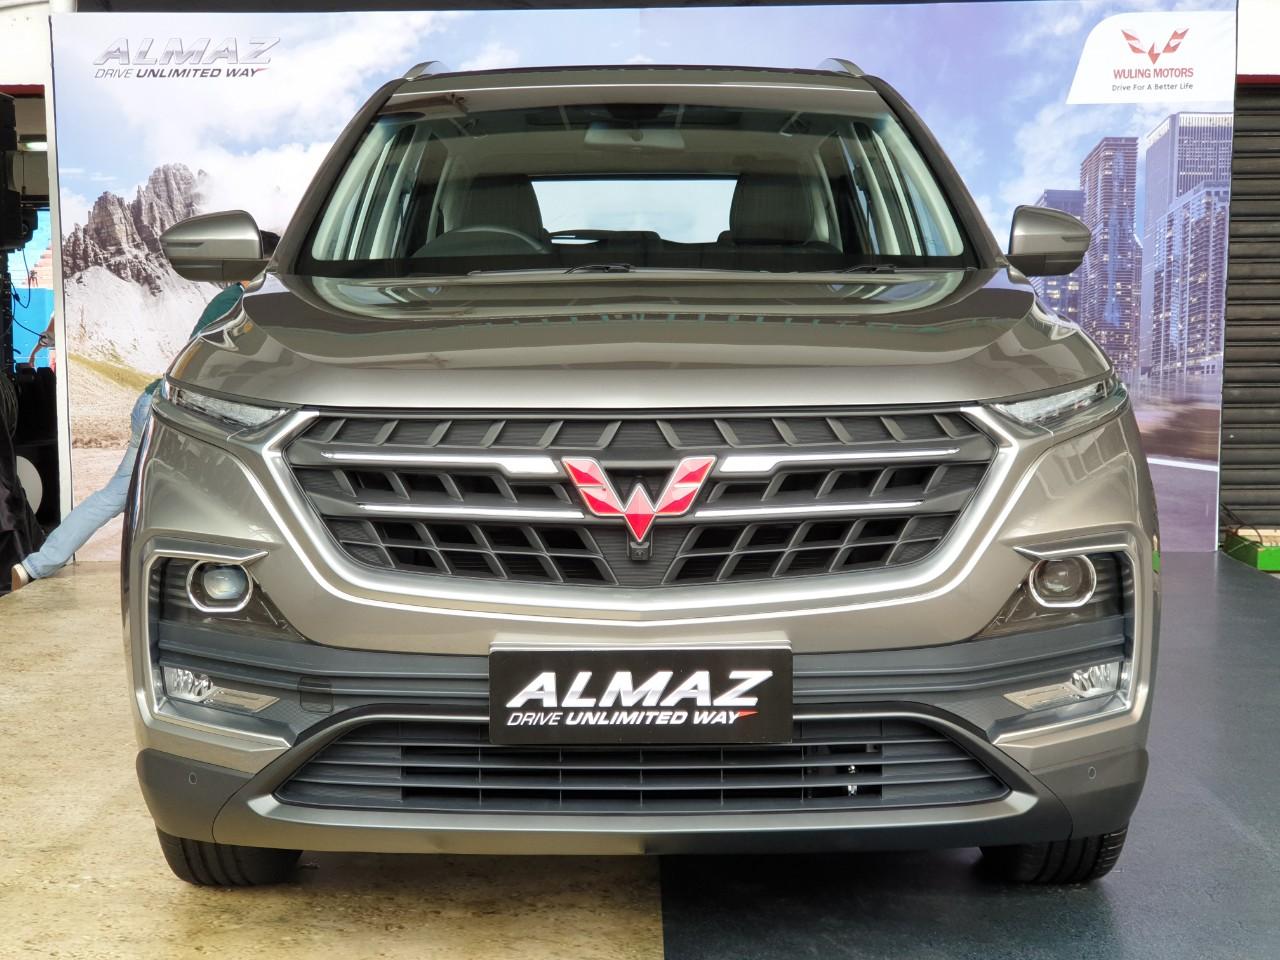 Wuling Almaz Rajai Segmen Medium SUV, Kalahkan Honda CR-V